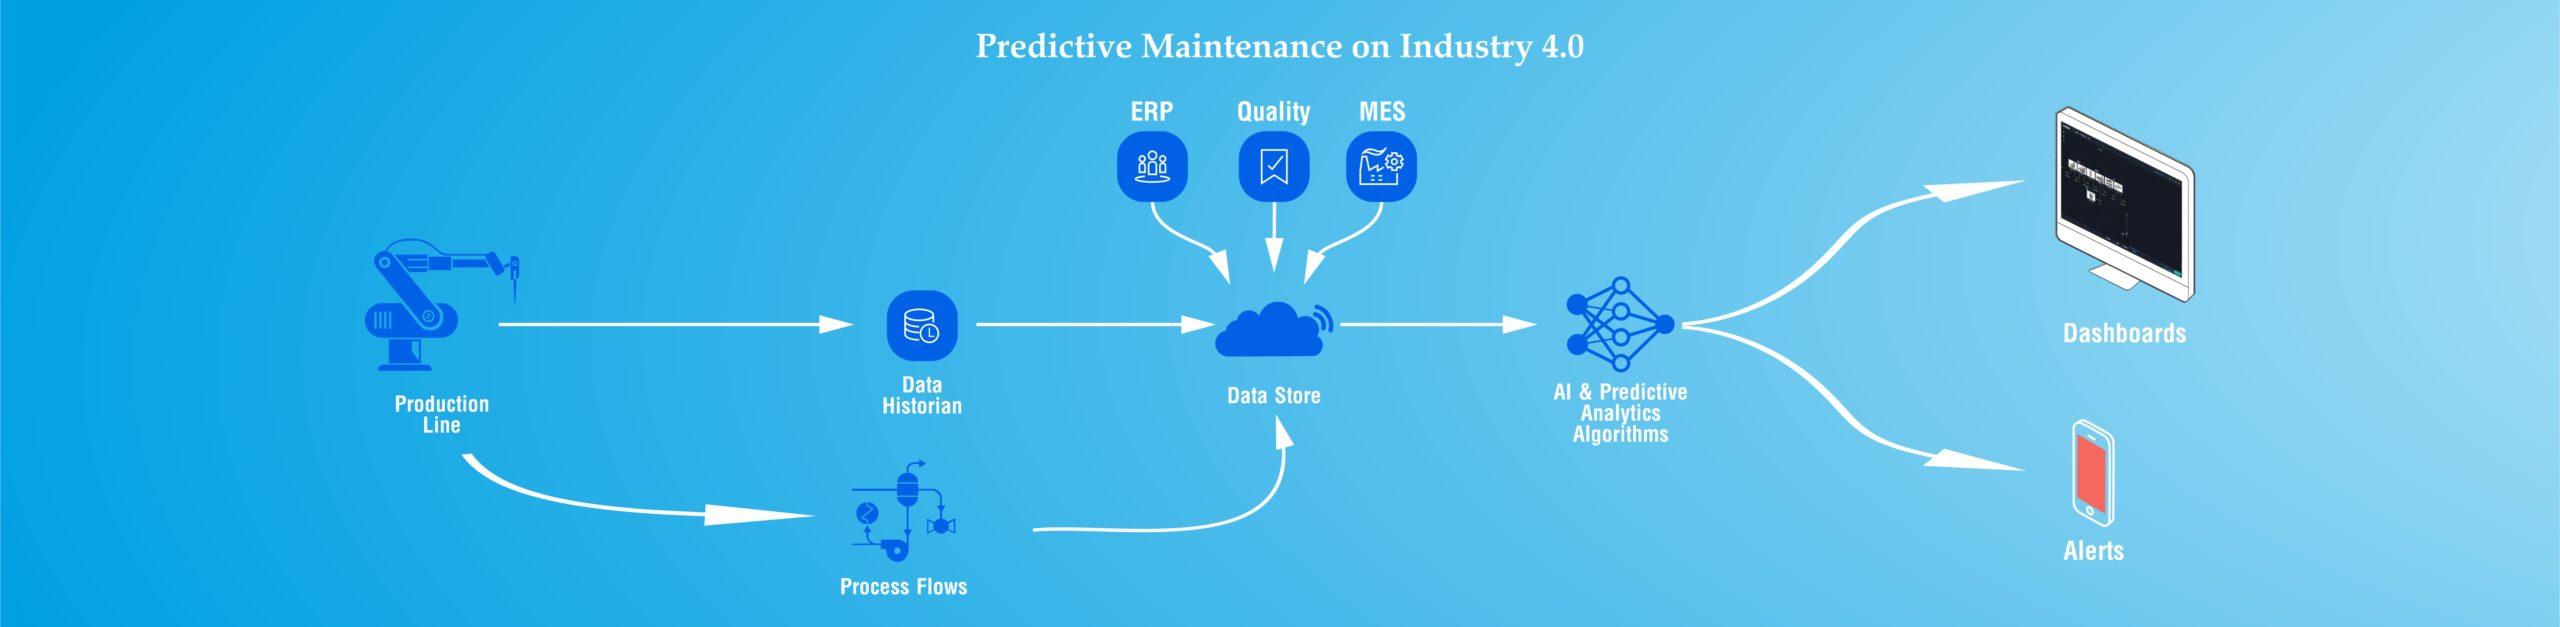 Predictive-Maintenance-studies